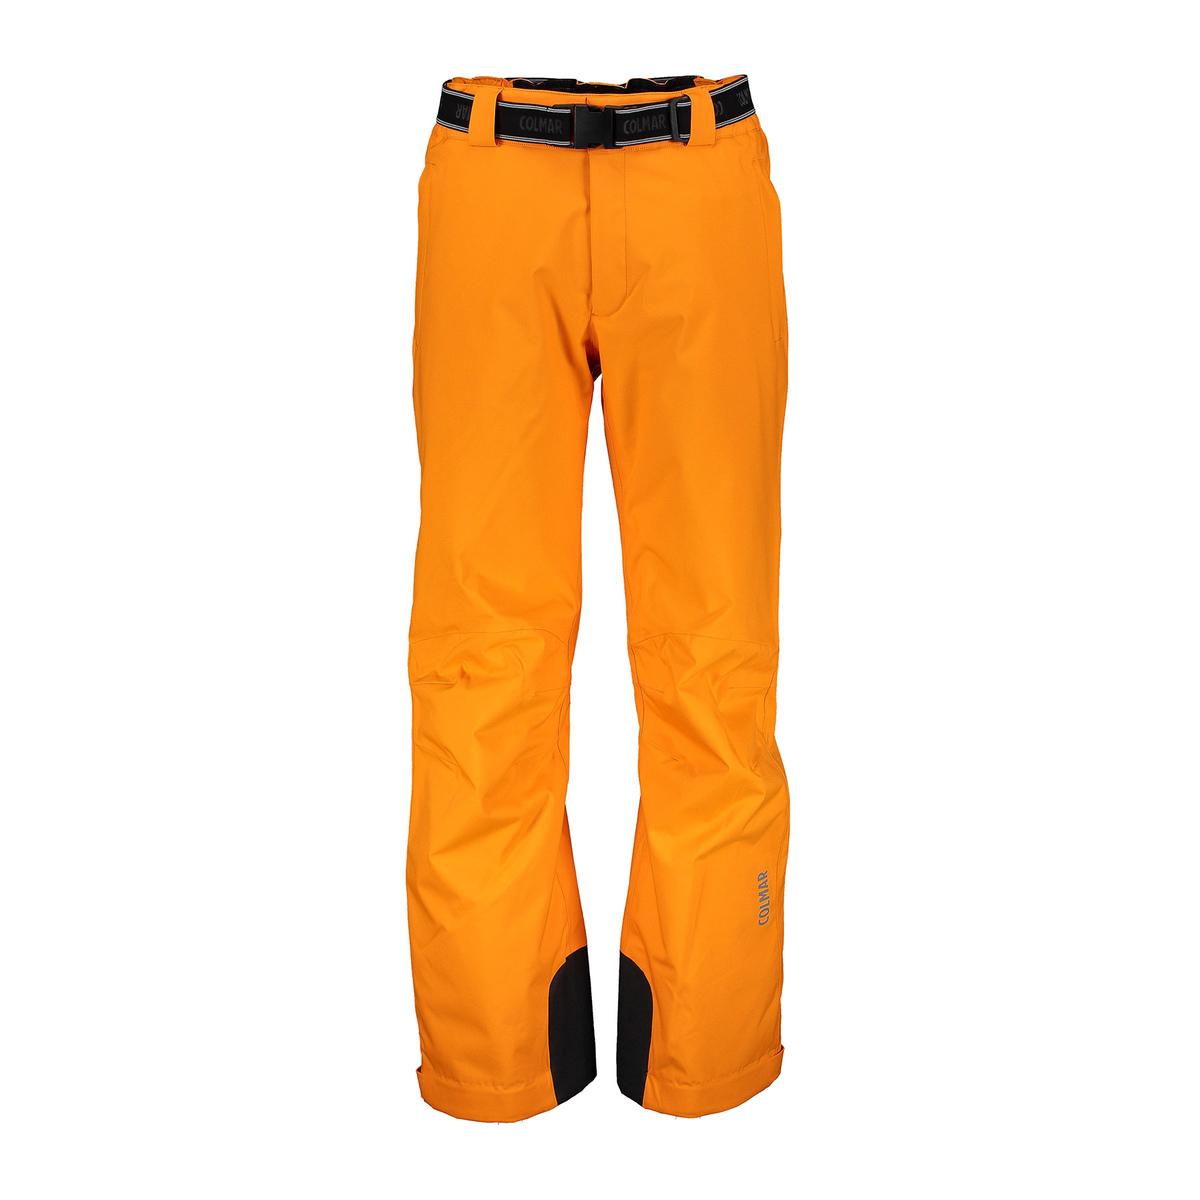 Prezzi Colmar pantaloni sapporo